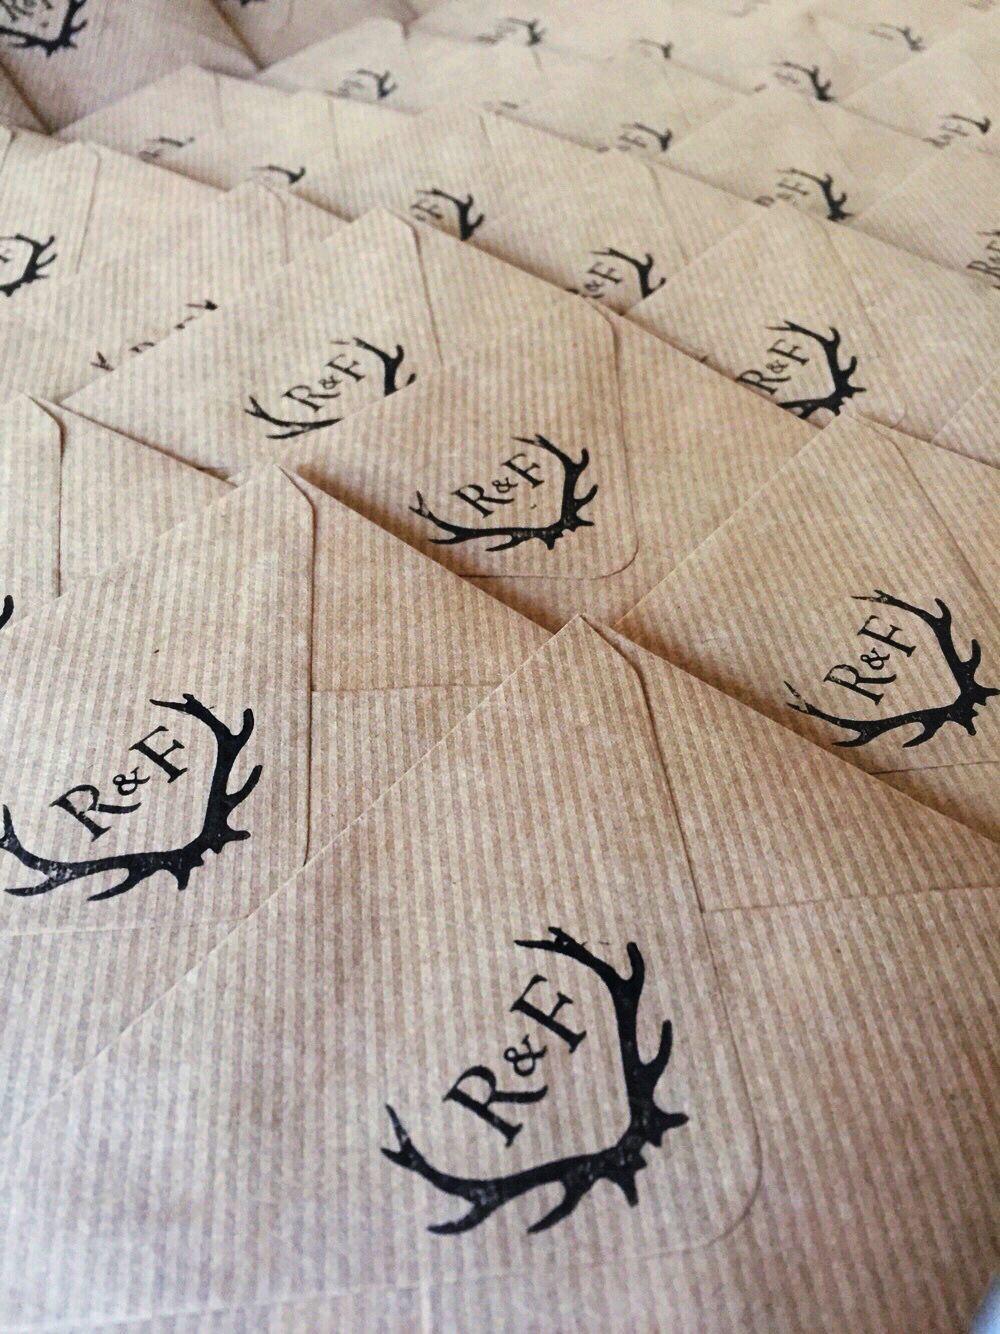 deer hunter wedding invitations%0A Antler monogram Rustic woodland deer wedding stationery rubber or self  inking stamp at brittlauren com